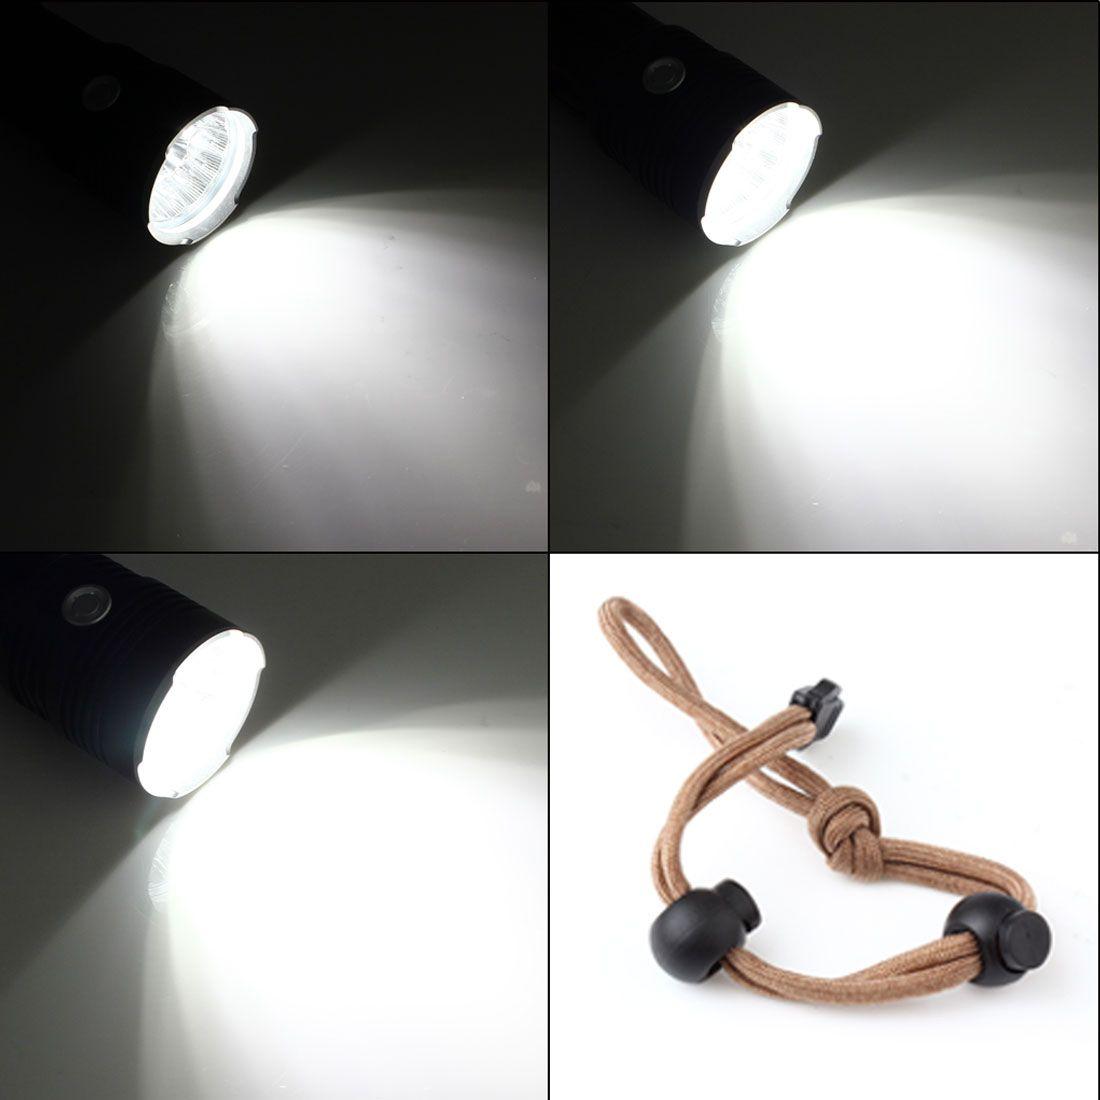 SKYRAY 12x XML-T6 Waterproof LED Torch Super Bright Backpacking Hunting Fishing Flashlight Torch Flash Lamp LEF_00I